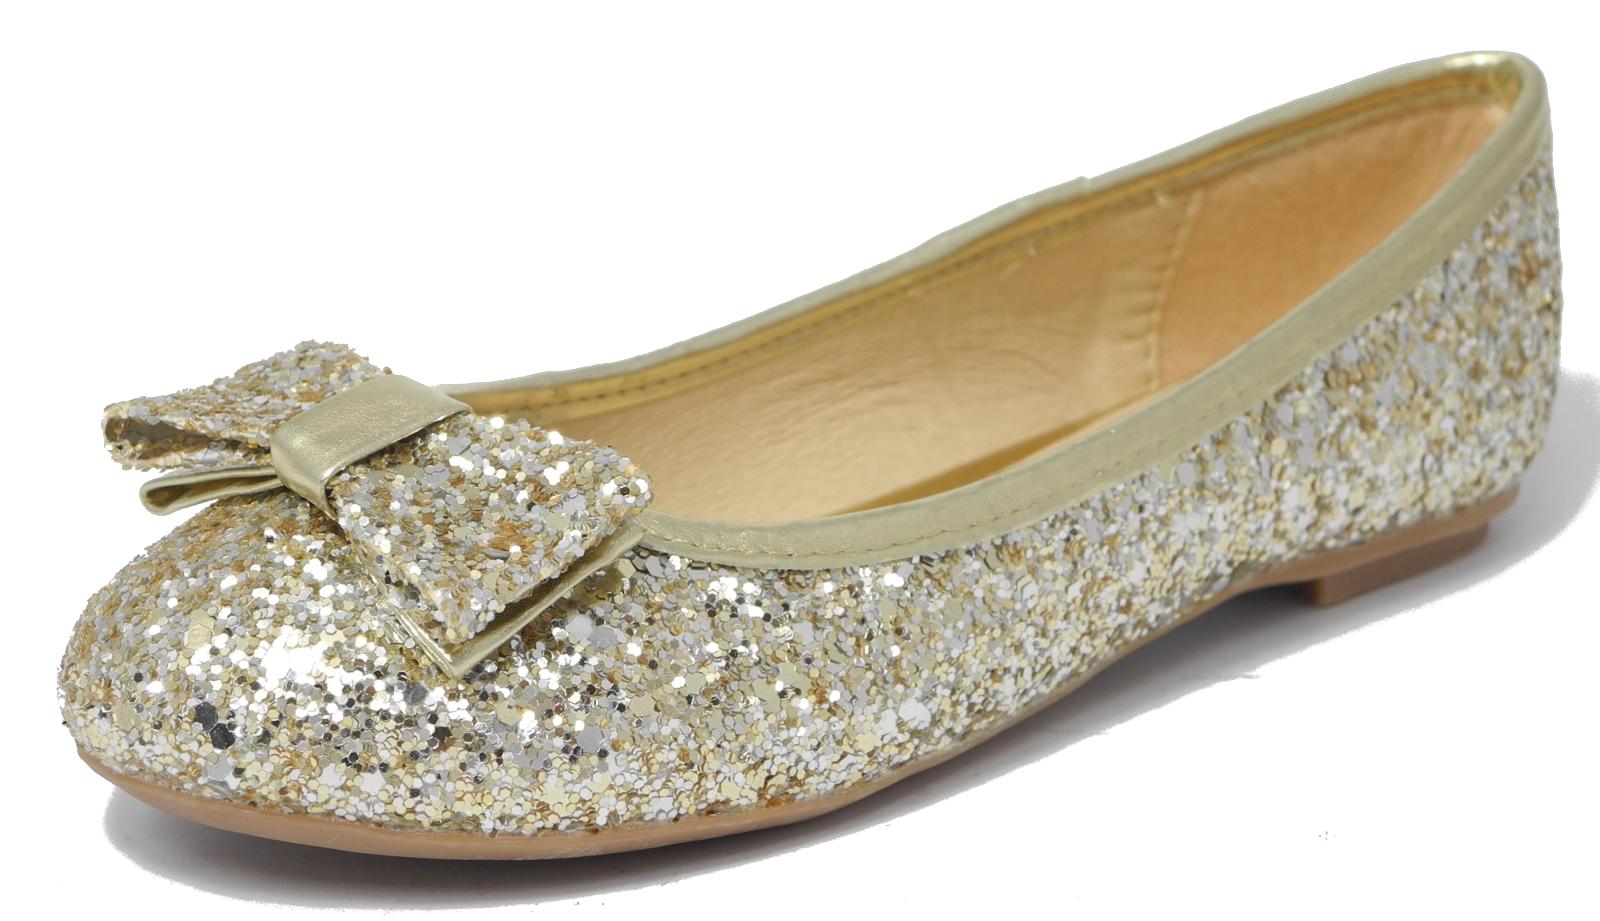 older girls teens gold sparkly glitter ballerina pumps party flats shoes sz 10 5 ebay. Black Bedroom Furniture Sets. Home Design Ideas